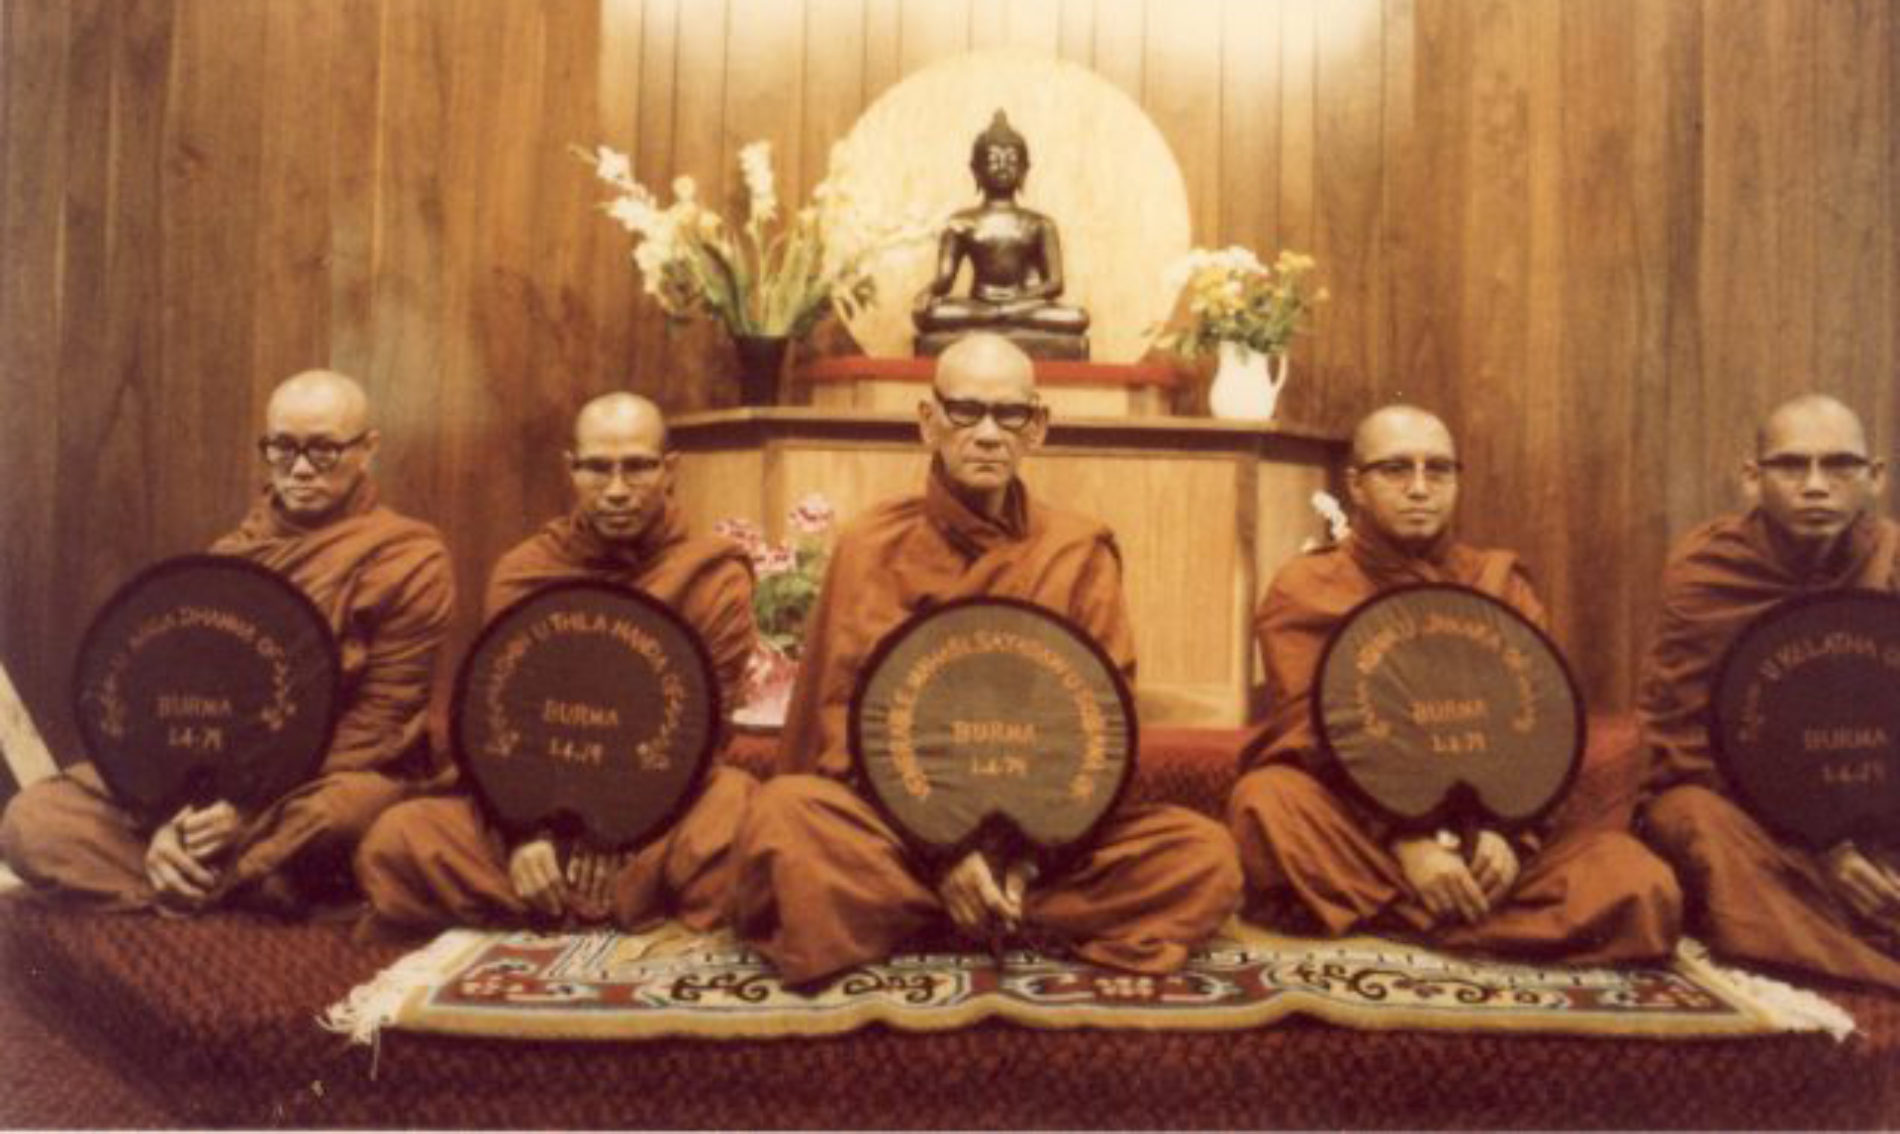 Махаси Саядо — Медитация Сатипаттхана Випассана (аудио-книга)